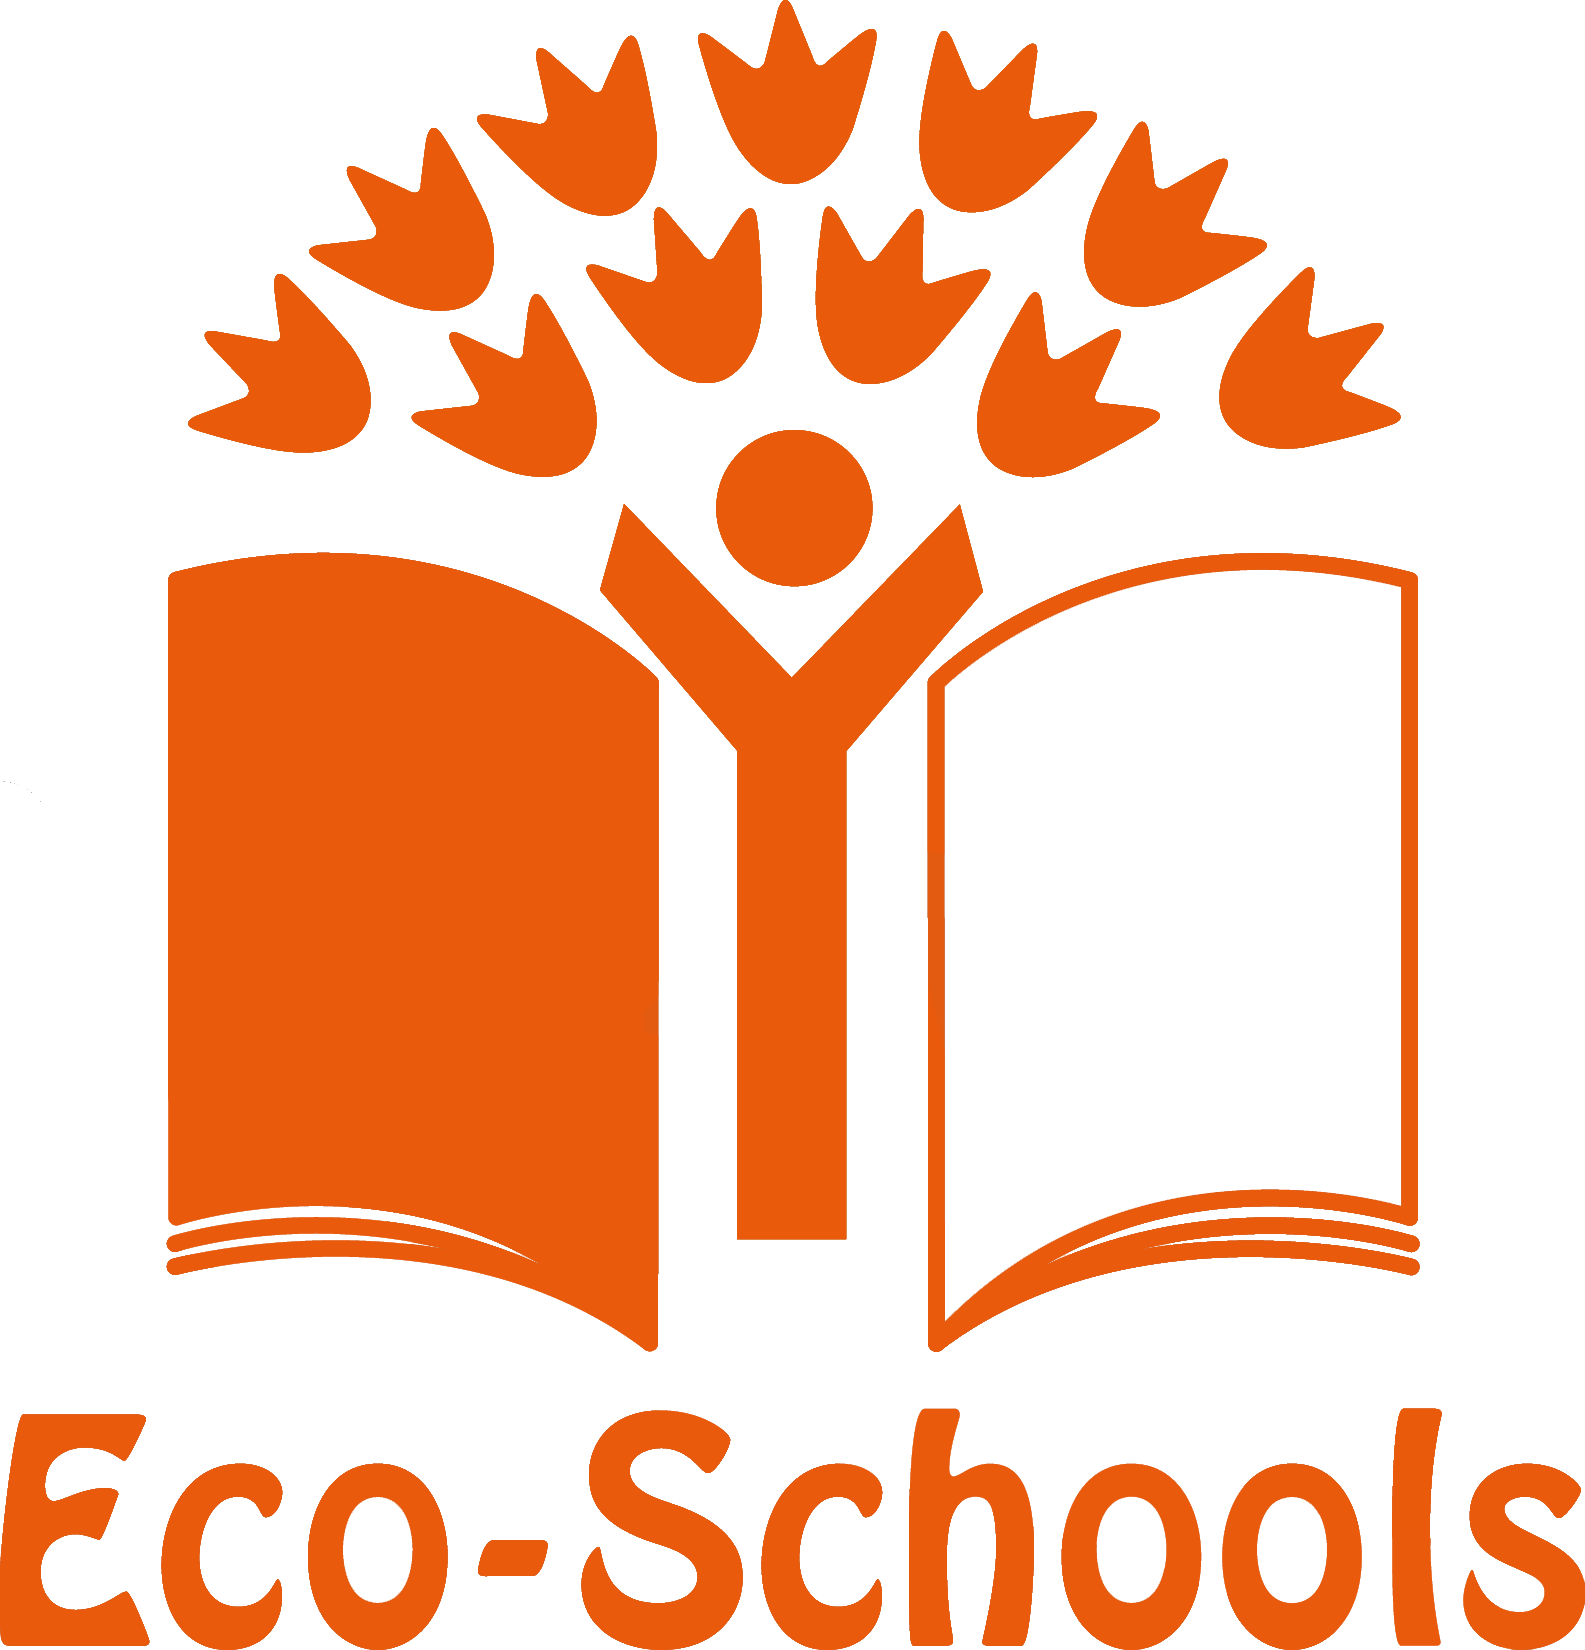 eco-schools_orange fond transparent